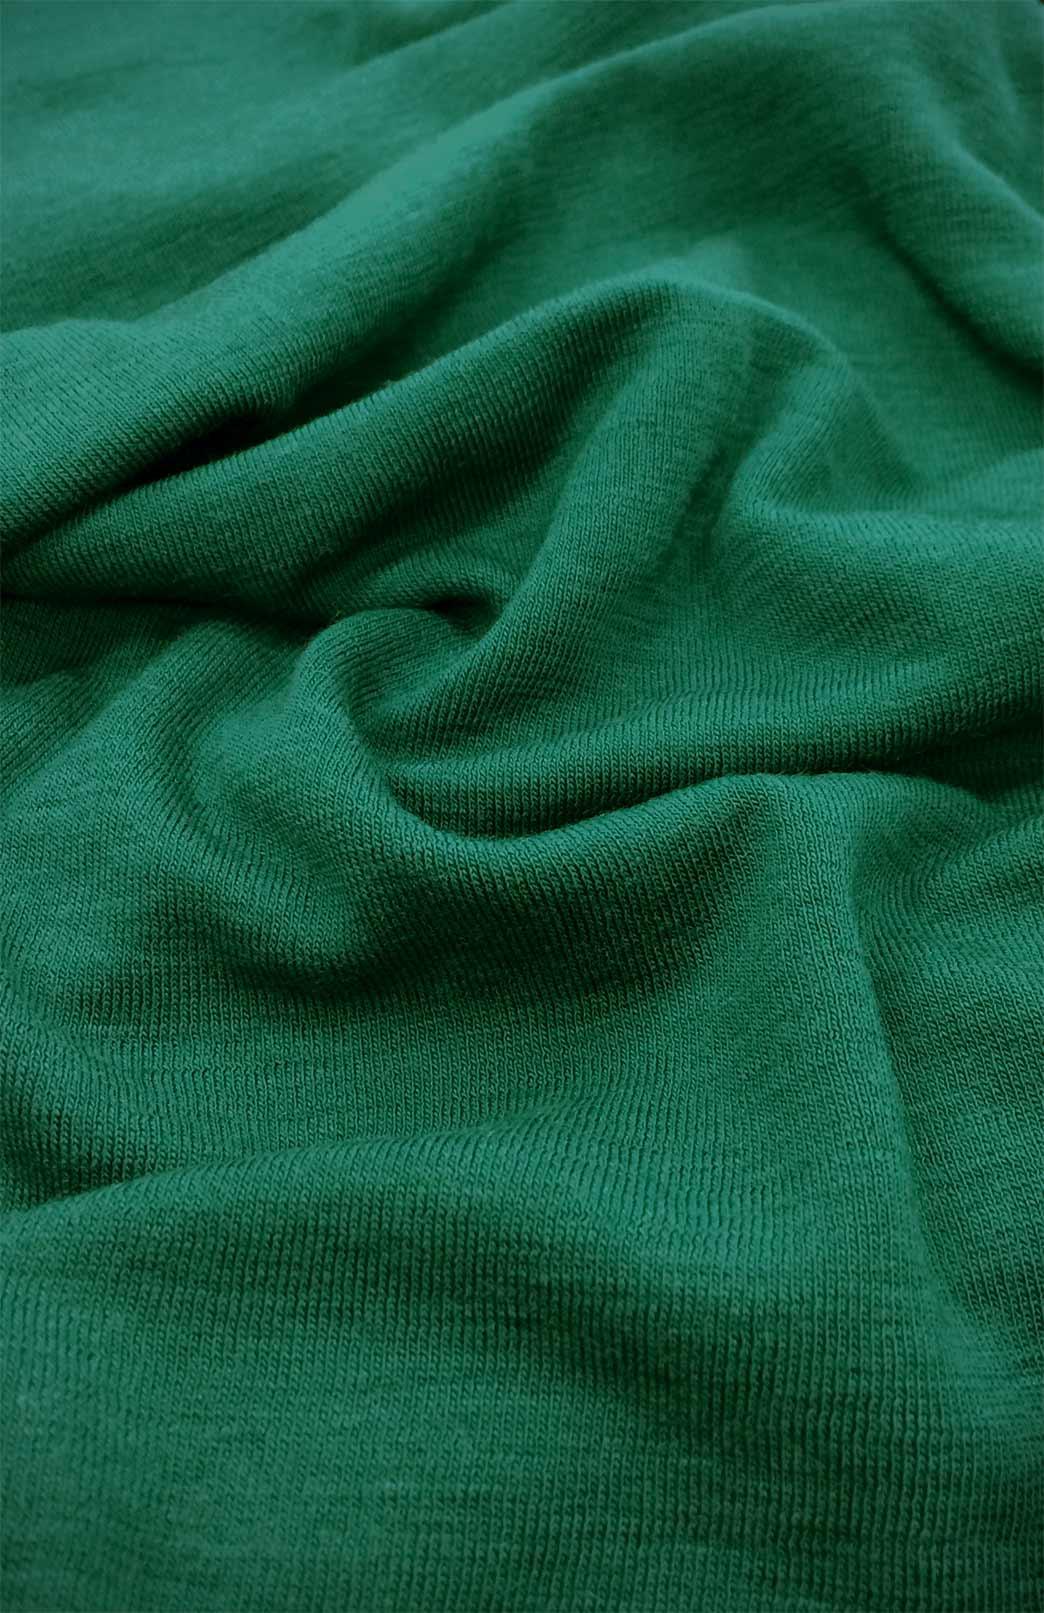 Cowl Neck Top - Sleeveless - Women's Pure Merino Wool Emerald Green Sleeveless Cowl Neck Top - Smitten Merino Tasmania Australia